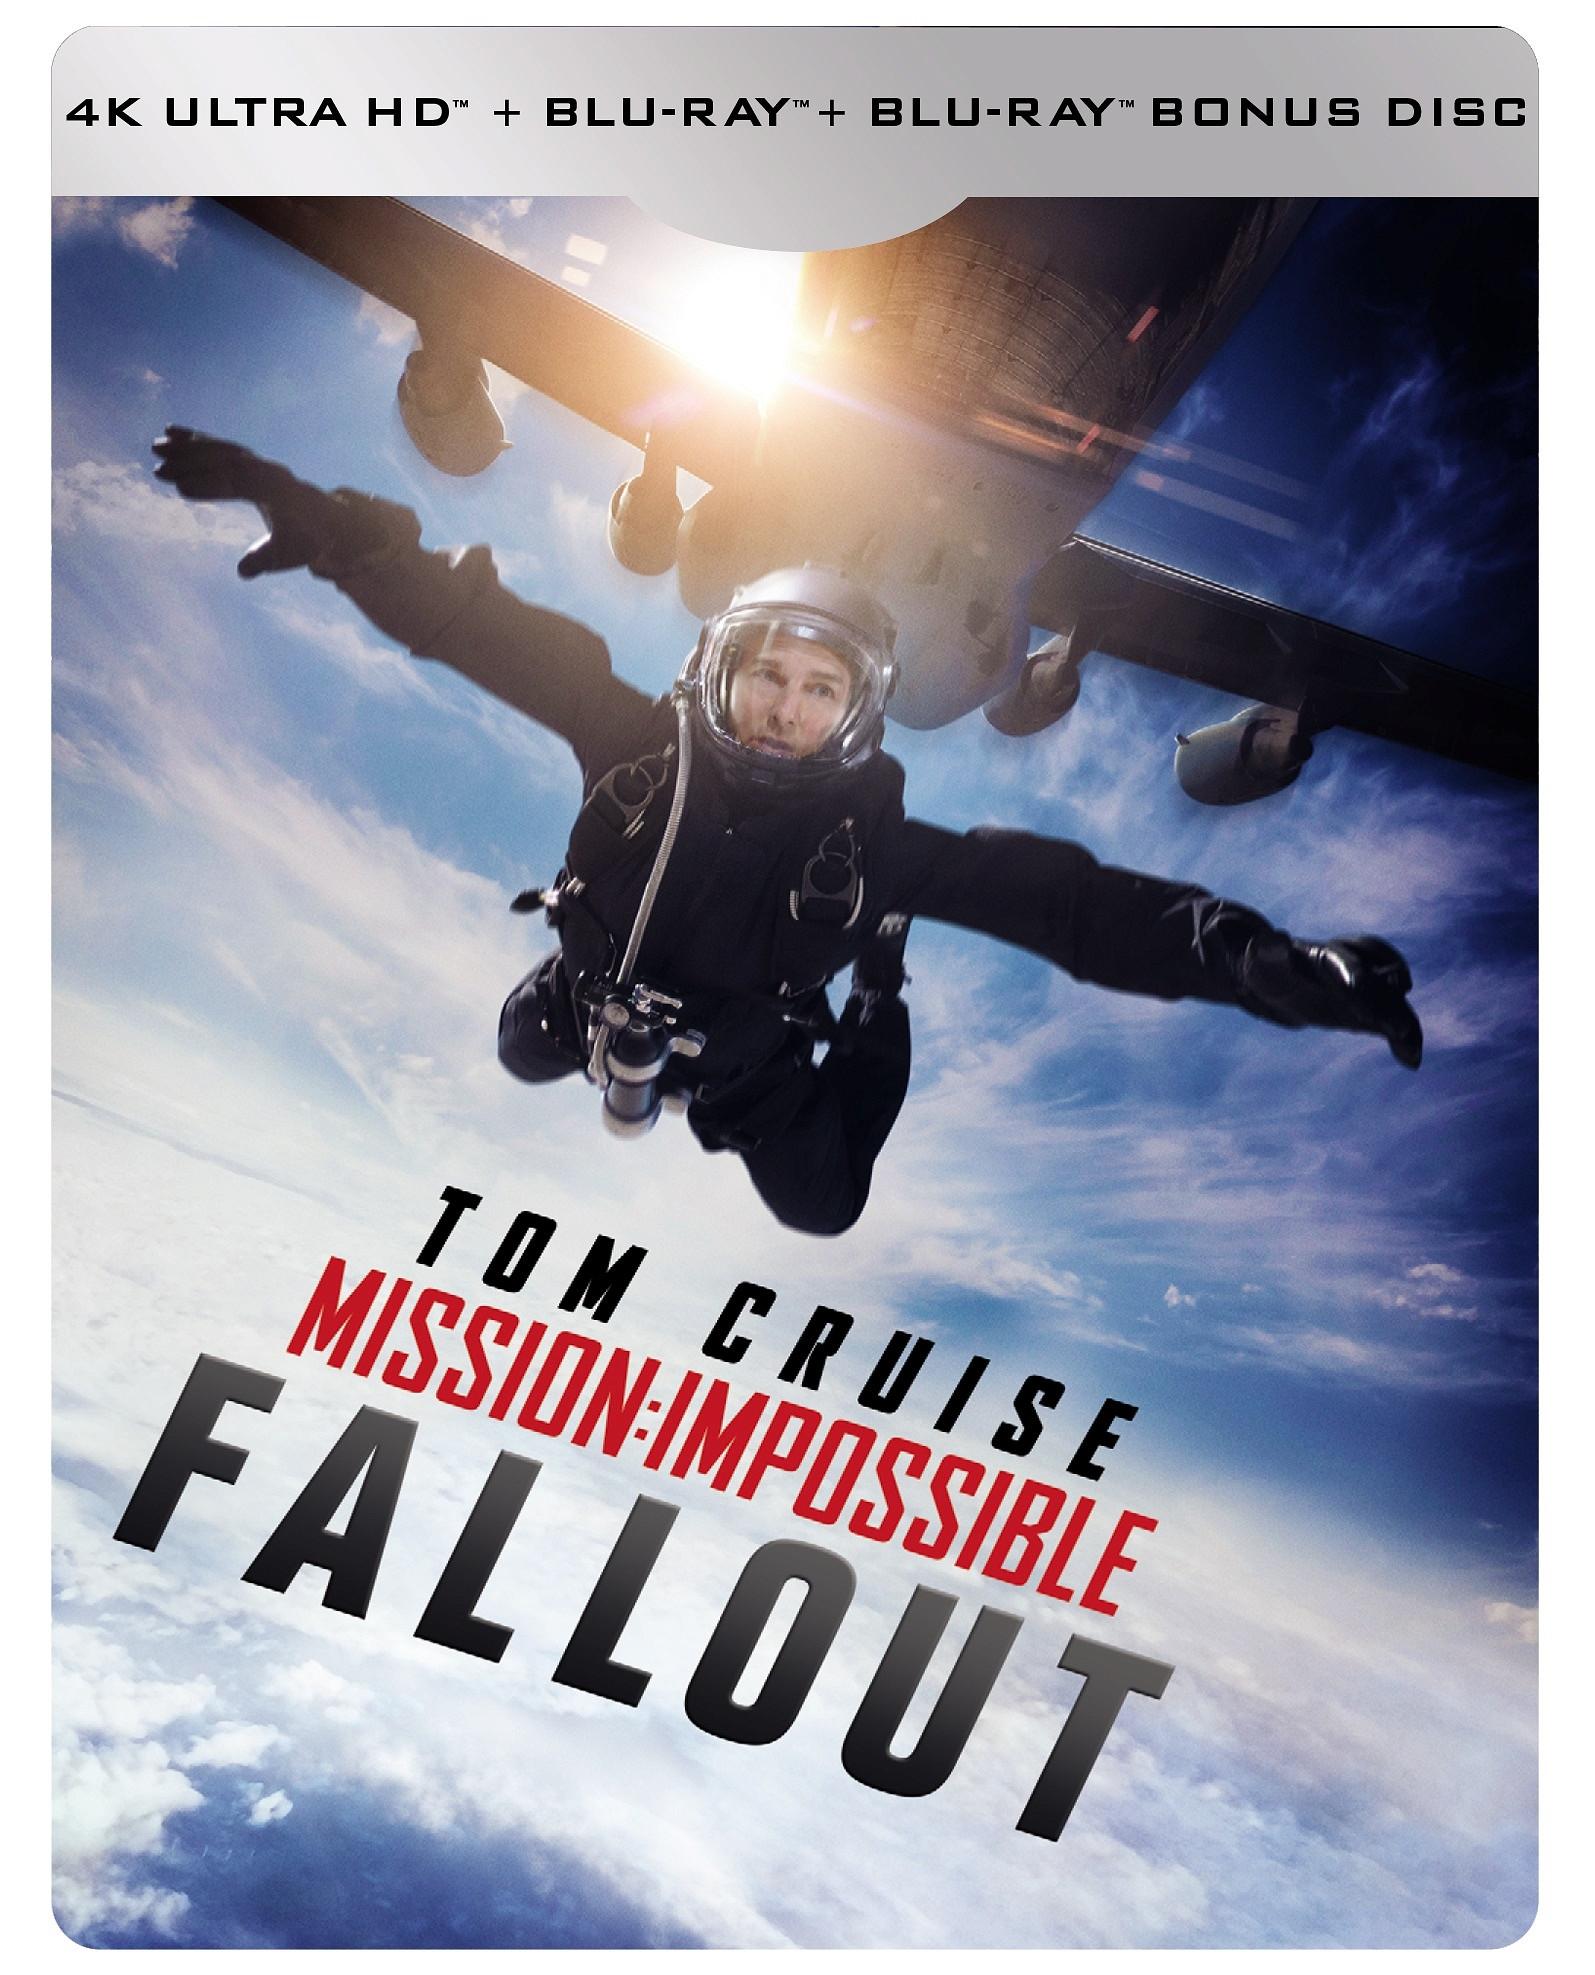 big_Mission-Impossible-6-Fallout-3xBD-4KUHD-steelbook-v2-12-2018-F.jpg